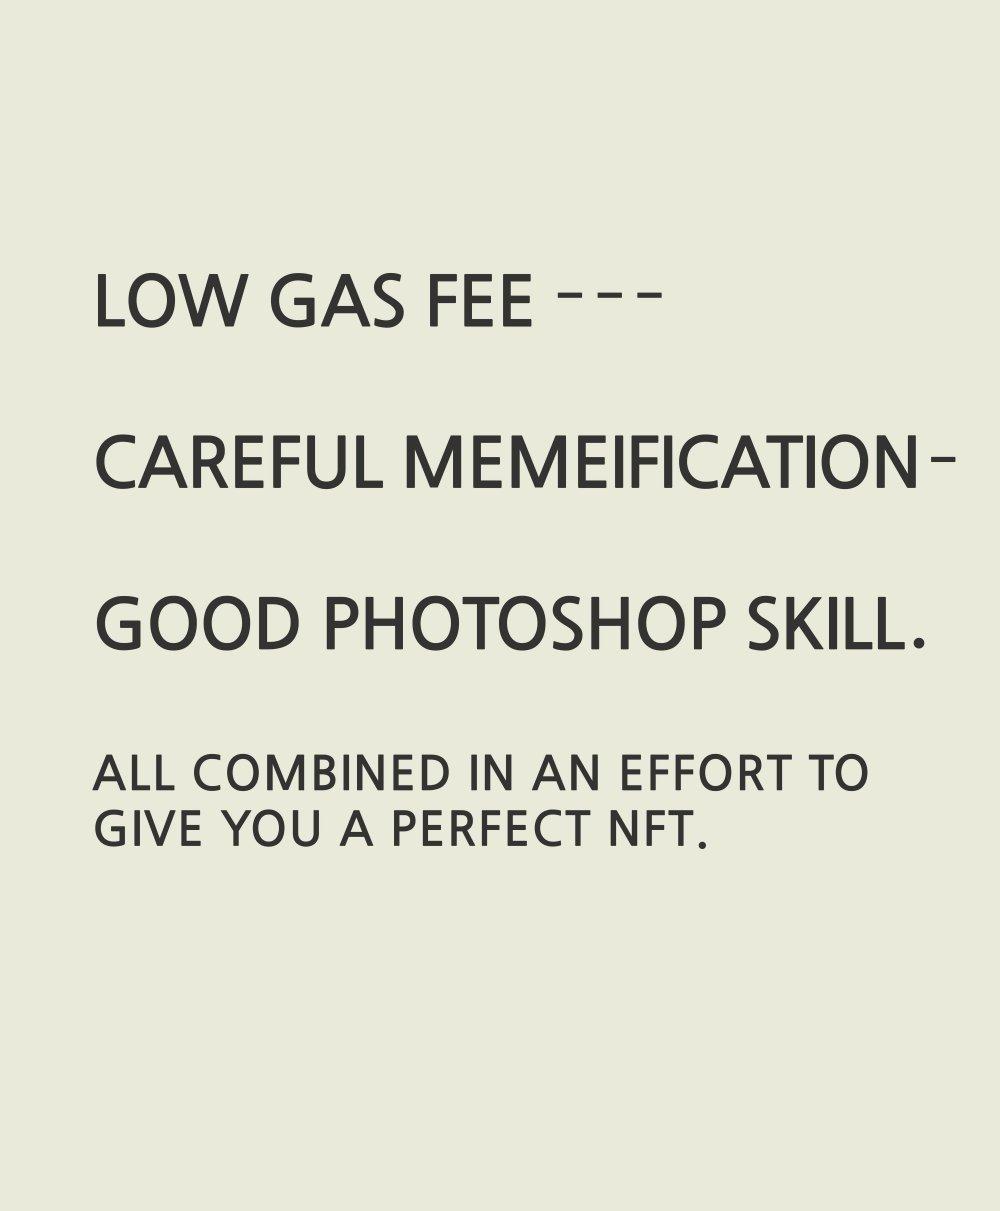 LOW GAS FEE